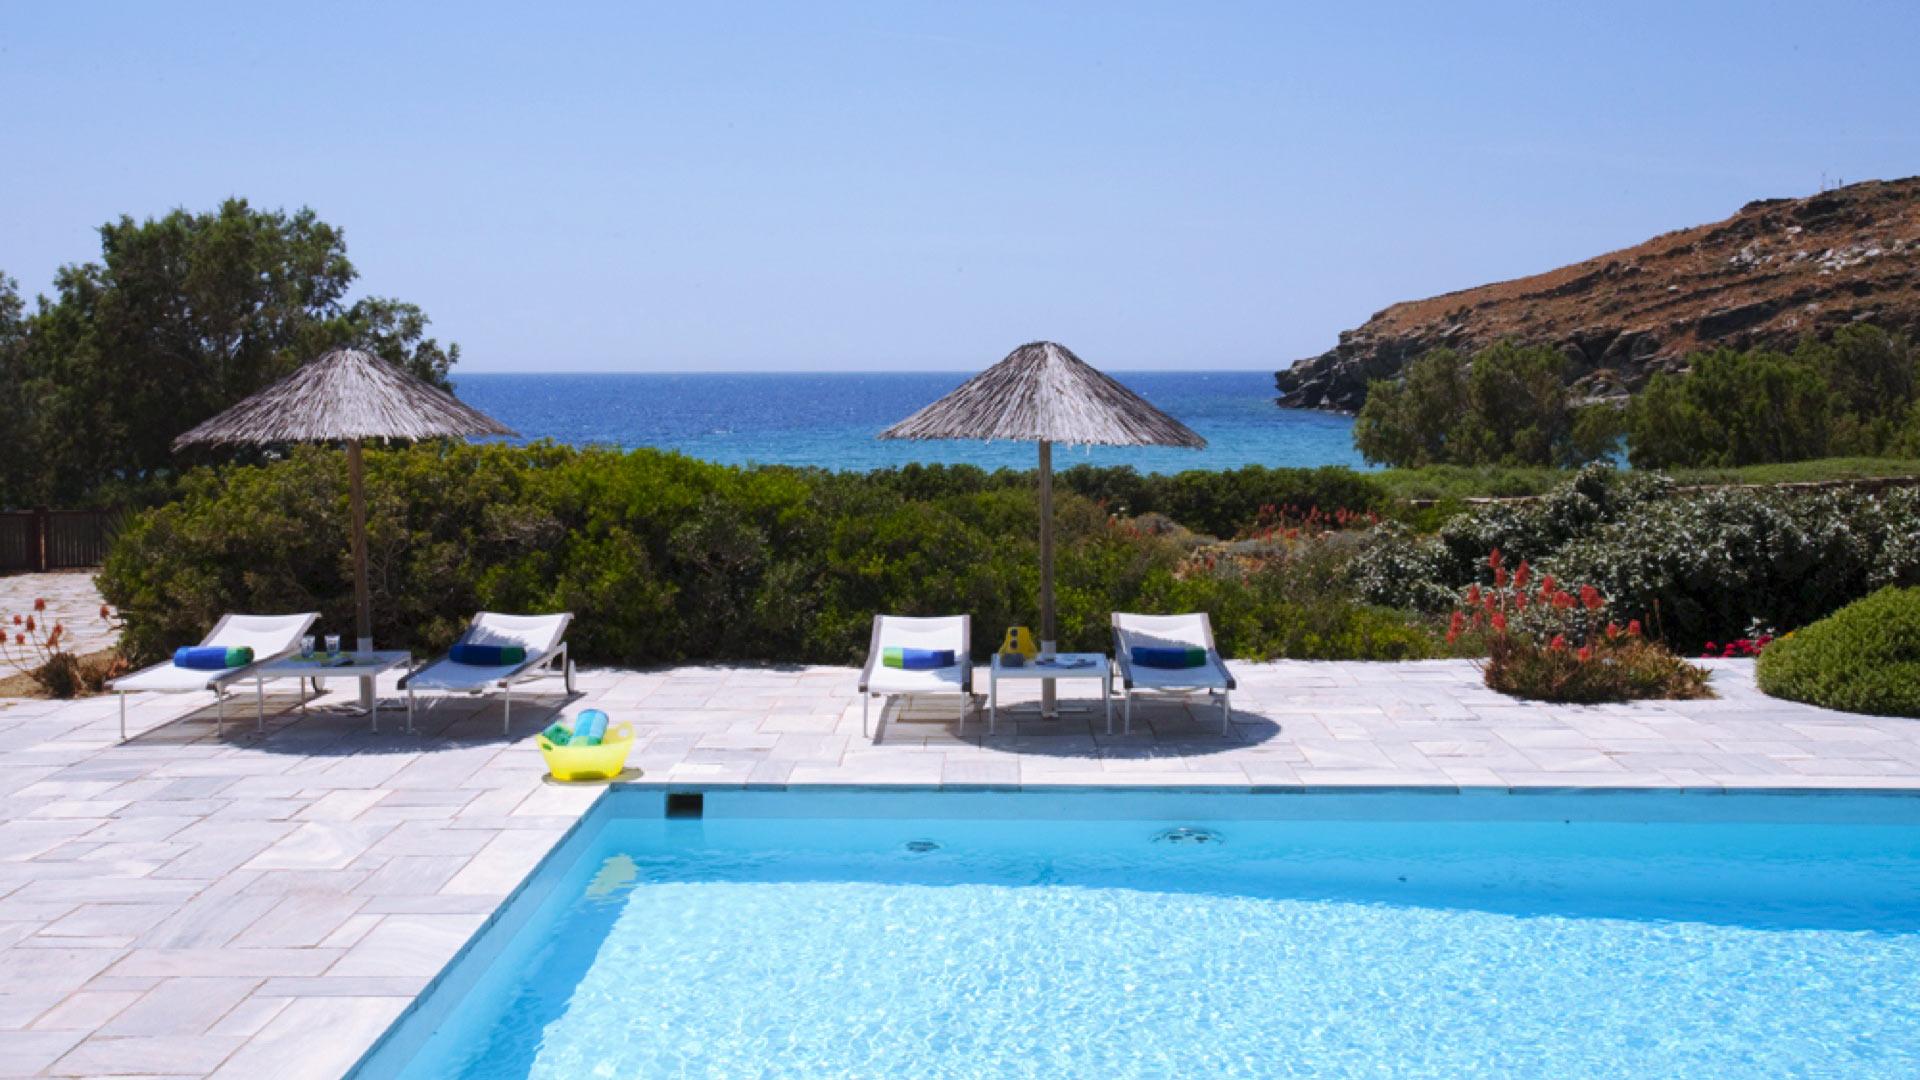 Luxury Villas Algarve Private Pool